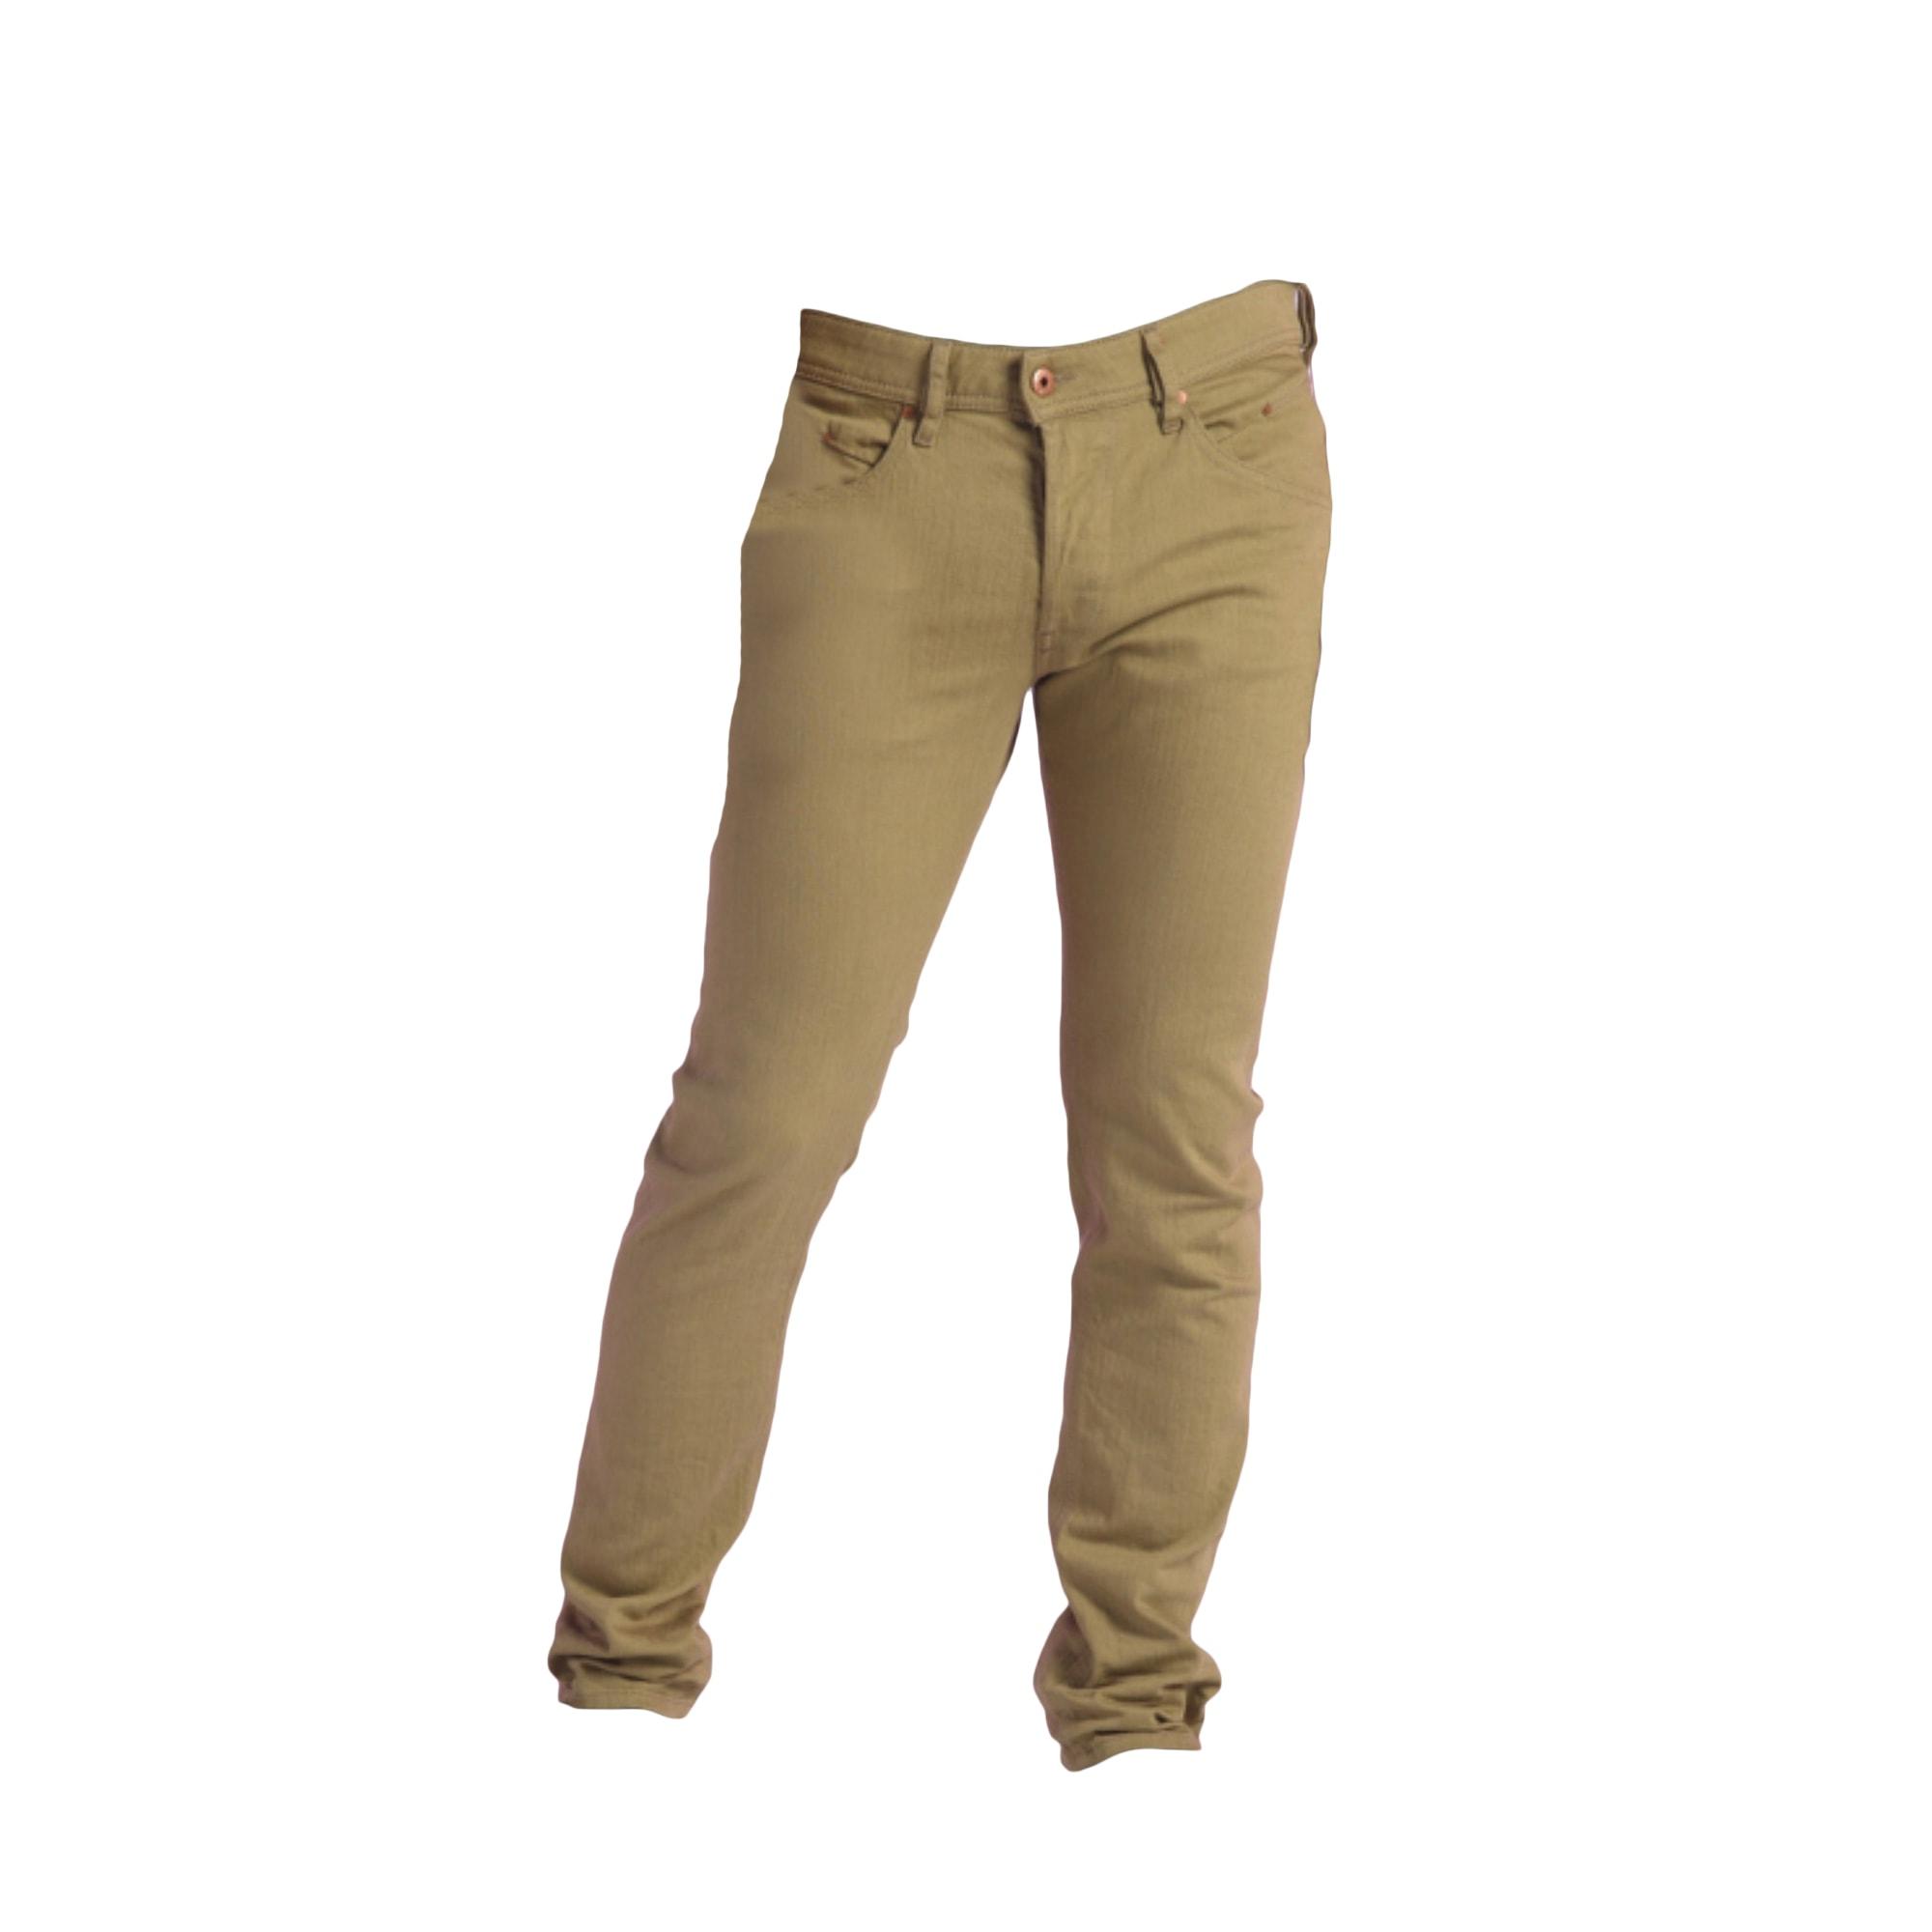 Jeans droit DIESEL Beige, camel